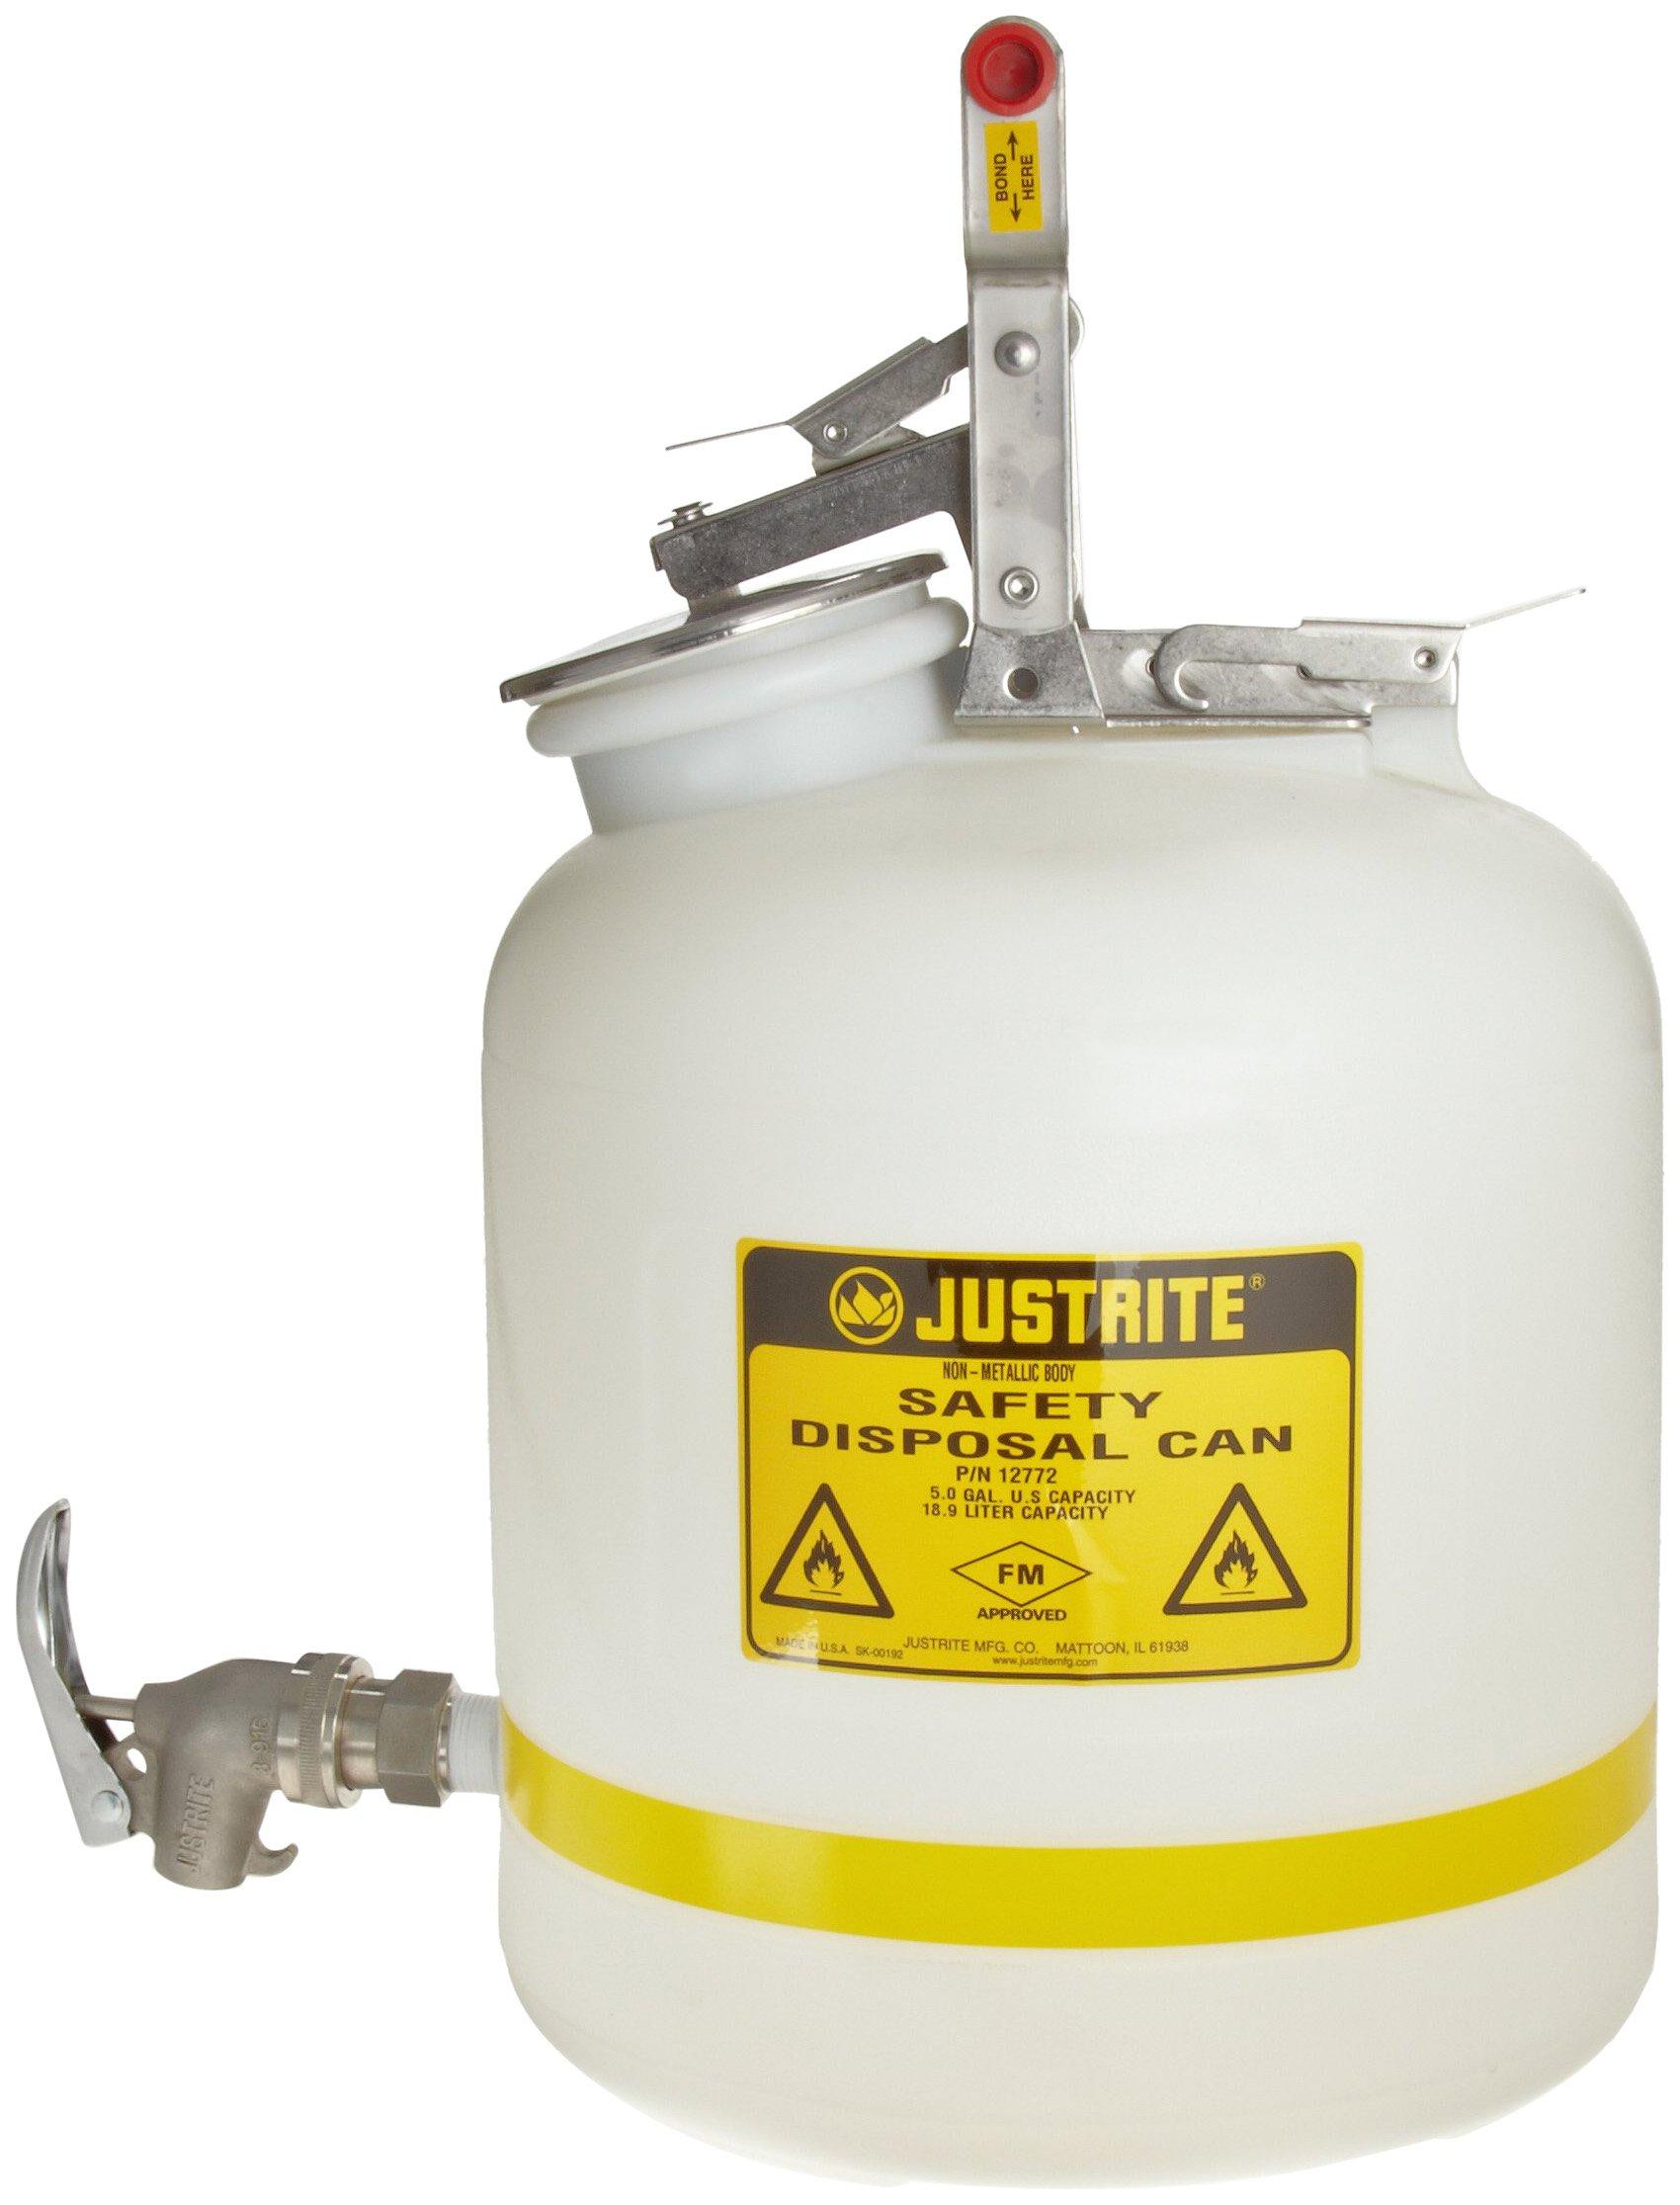 Justrite 12772 5 Gallon Capacity, 12.0'' OD x 20'' HT Laboratory Faucet Premium White Translucent Polyethylene Safety Can